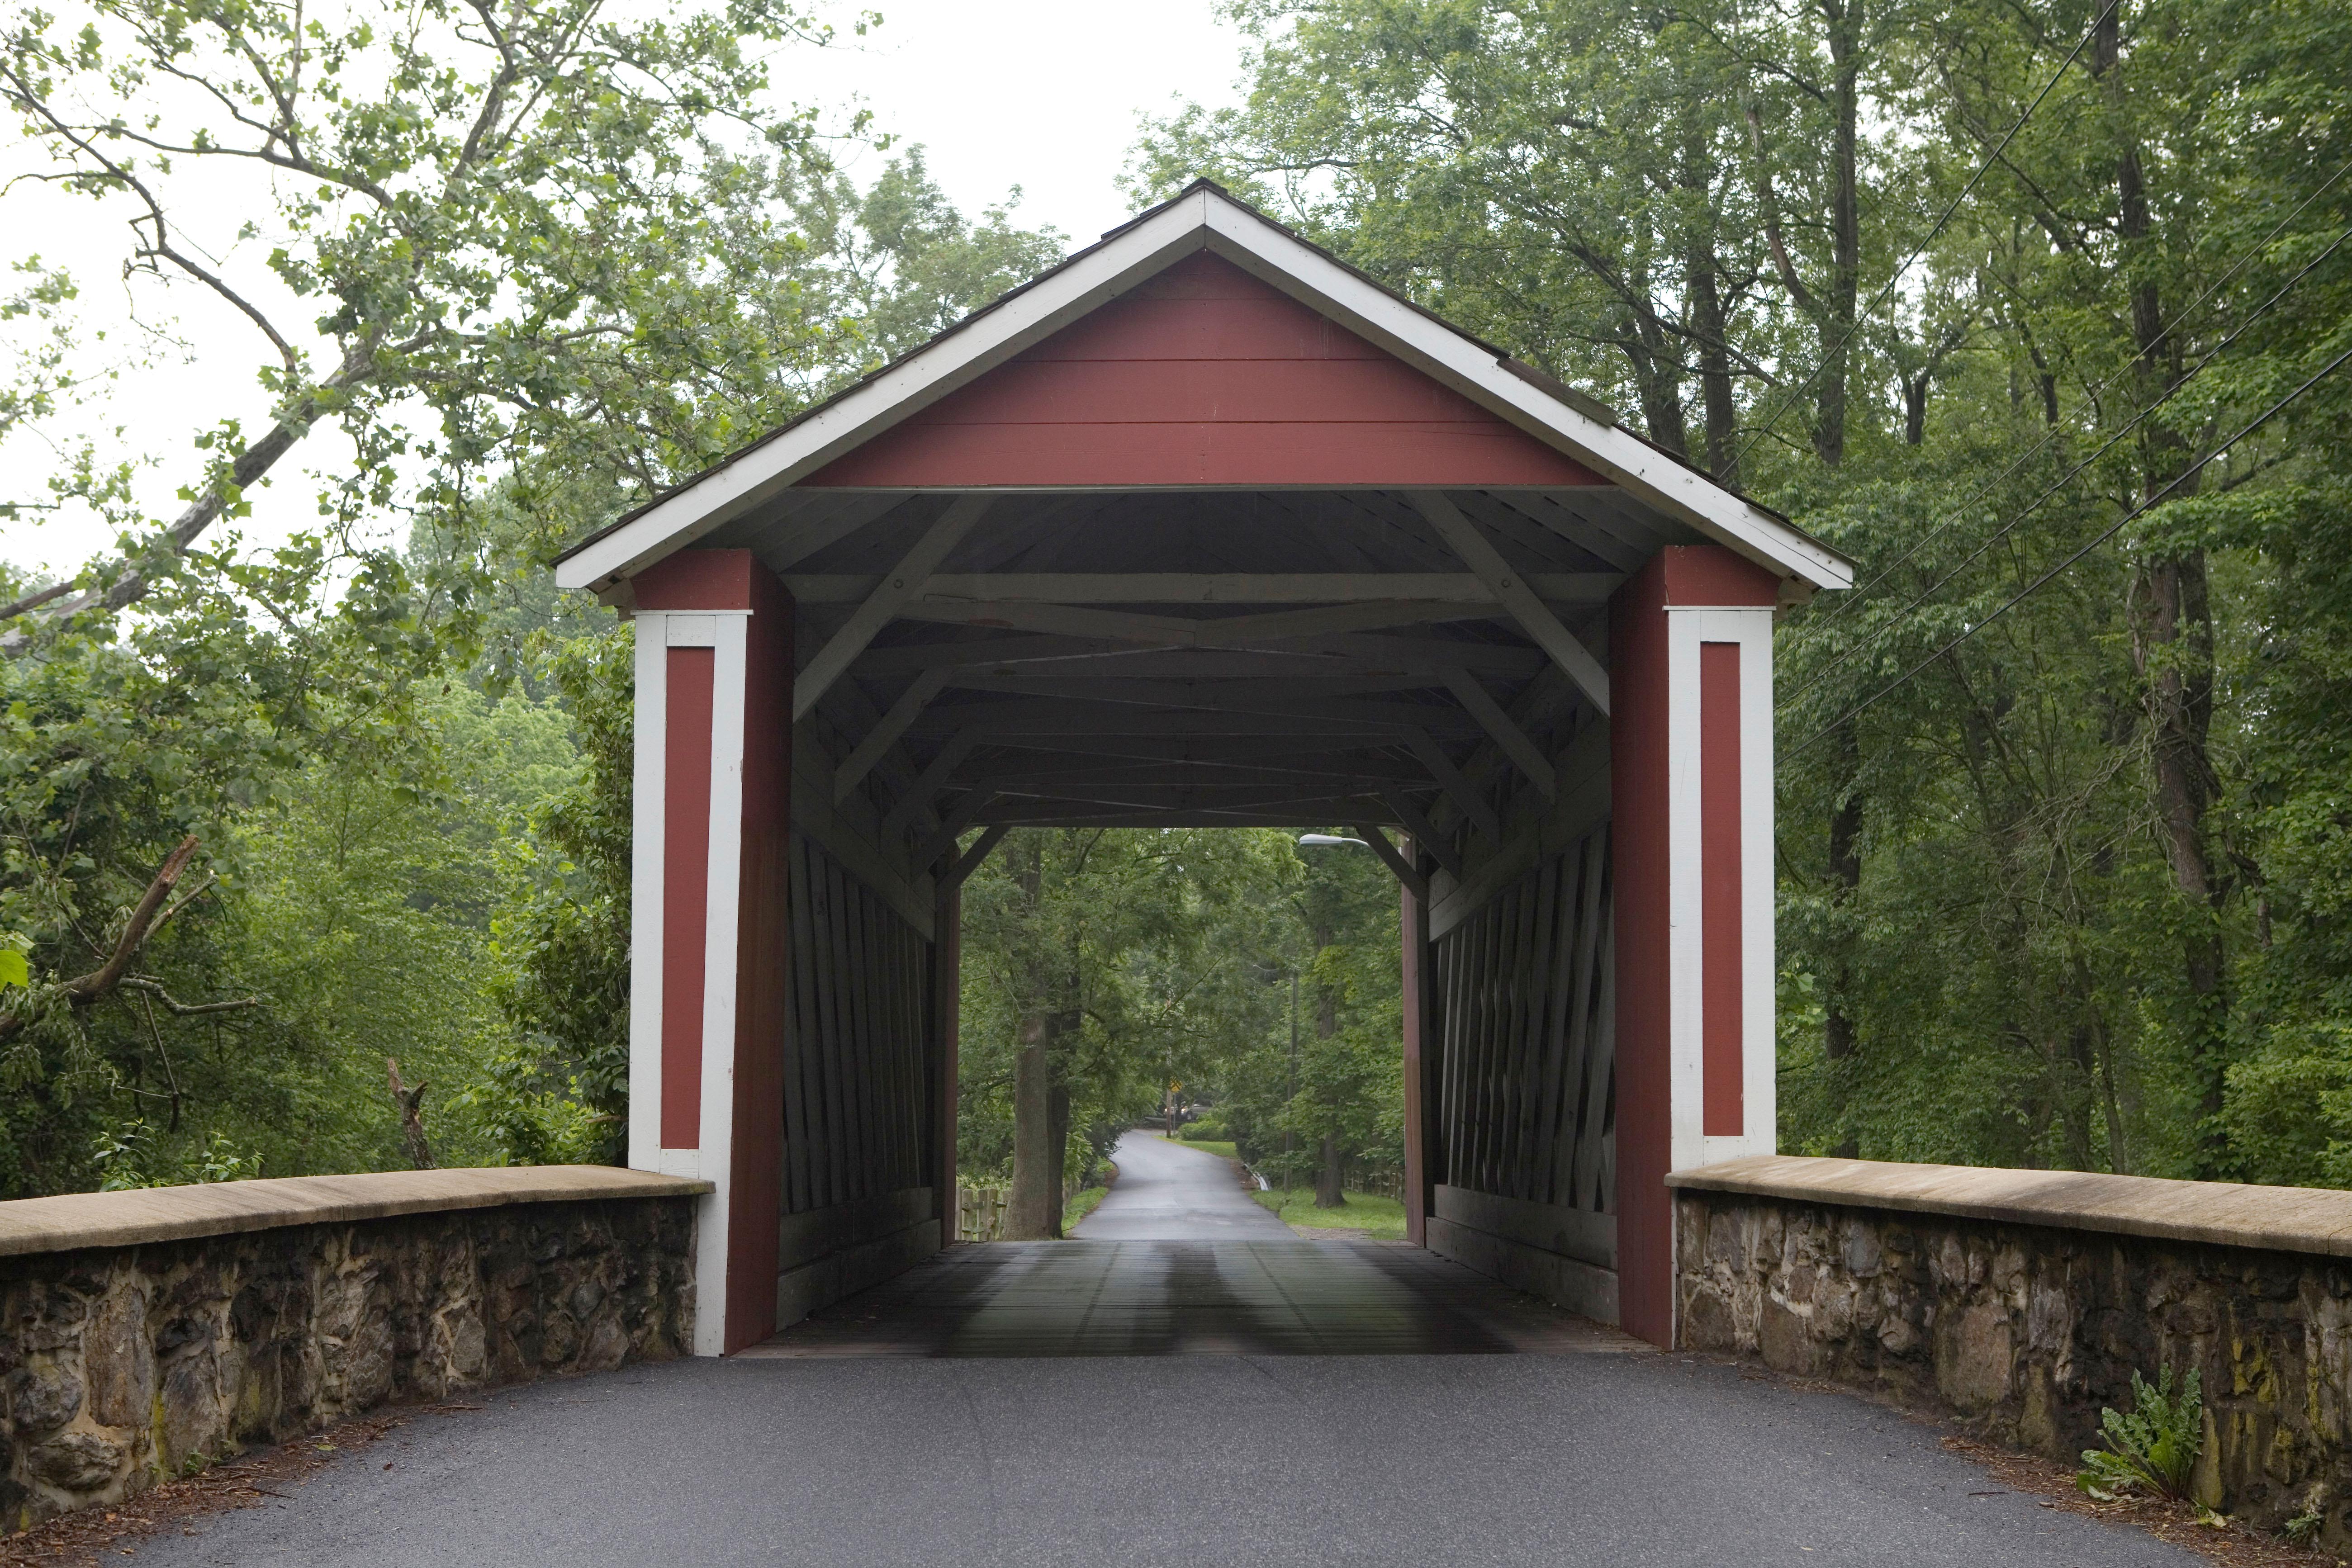 Ashland Covered Bridge over Red Clay Creek, Hockessin, Delaware. Photo by Janet Worne